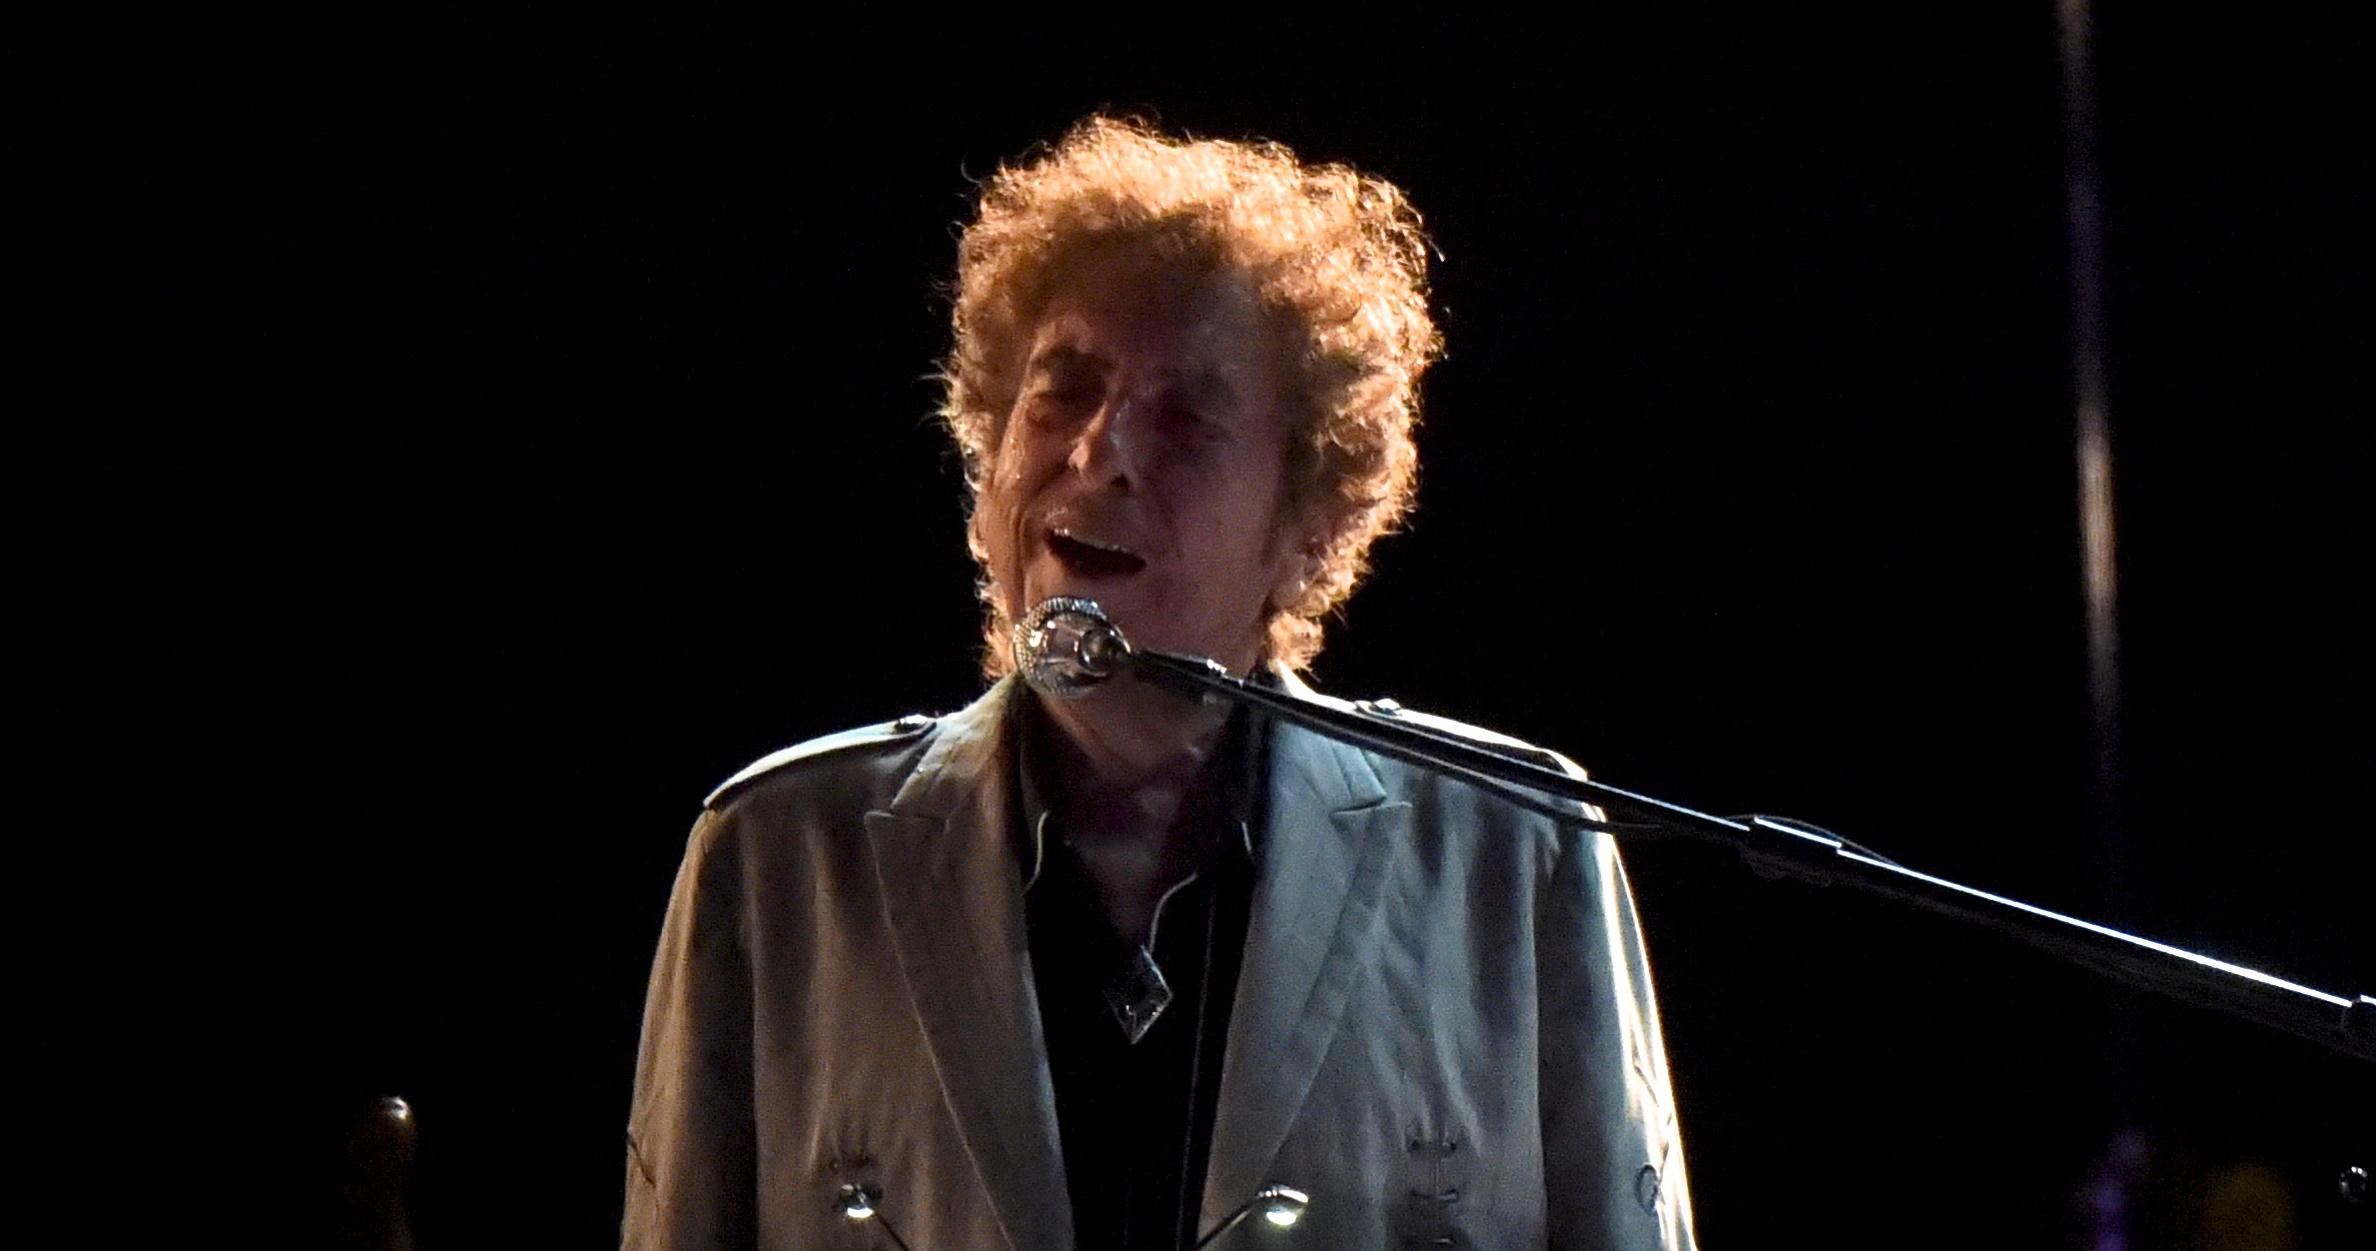 Bob Dylan: Έκπληξη με δεύτερο καινούργιο τραγούδι (video)